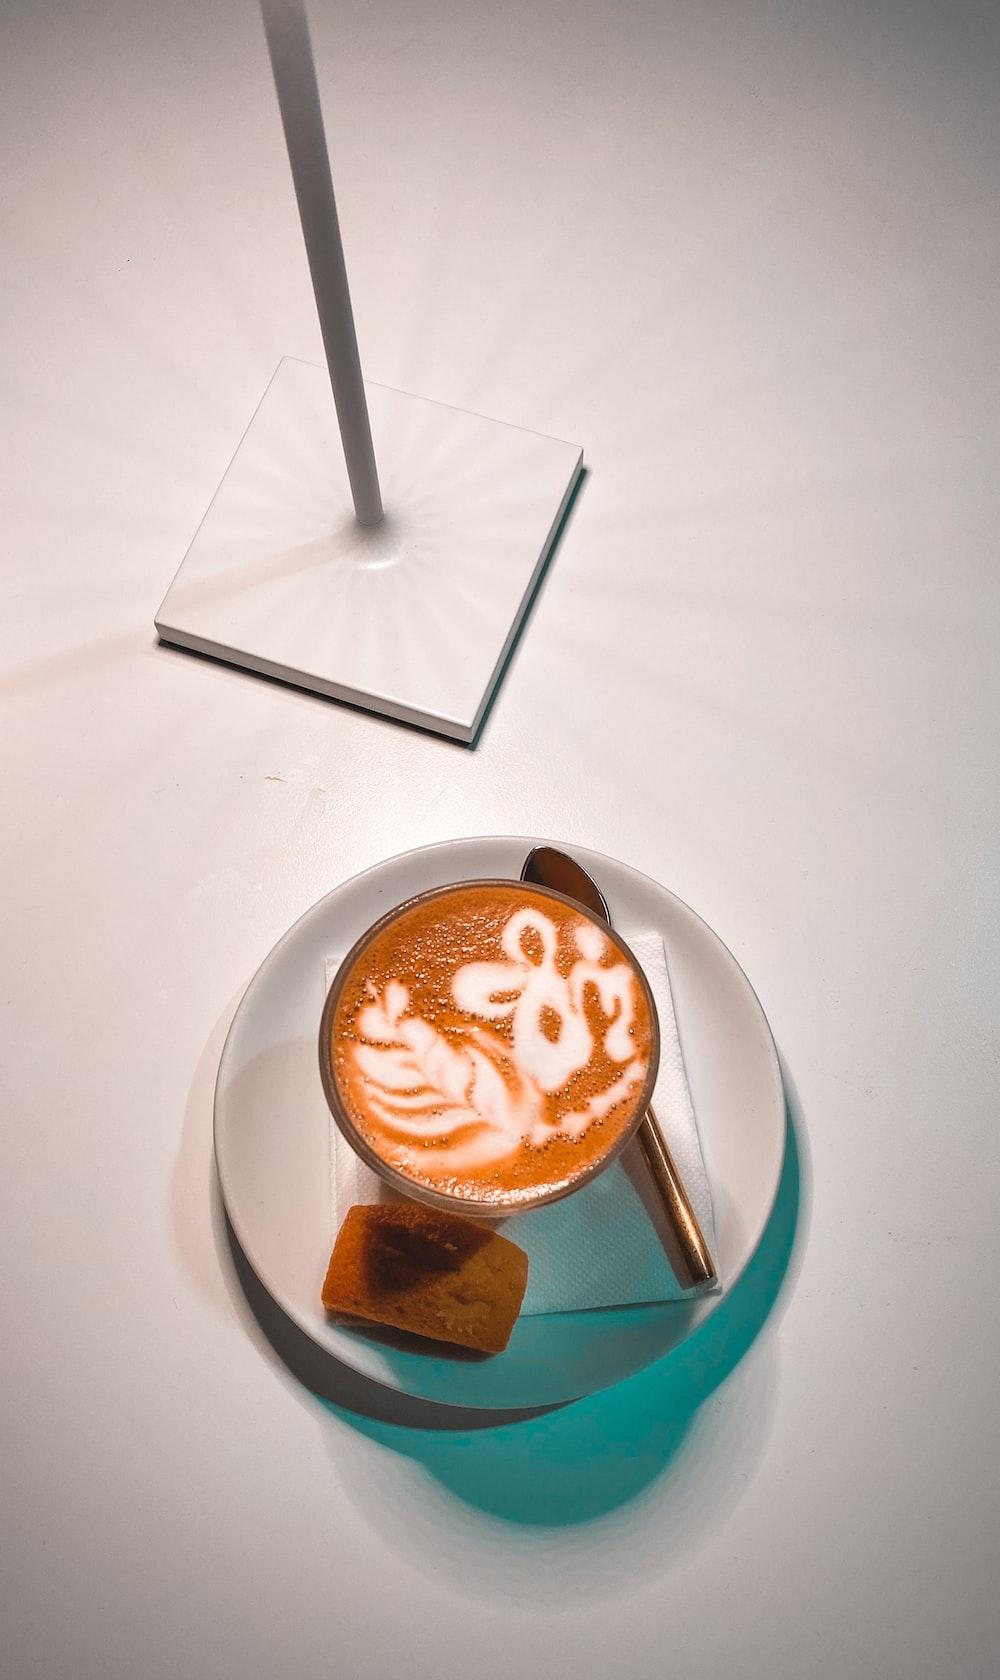 white ceramic mug with cappuccino on white ceramic saucer